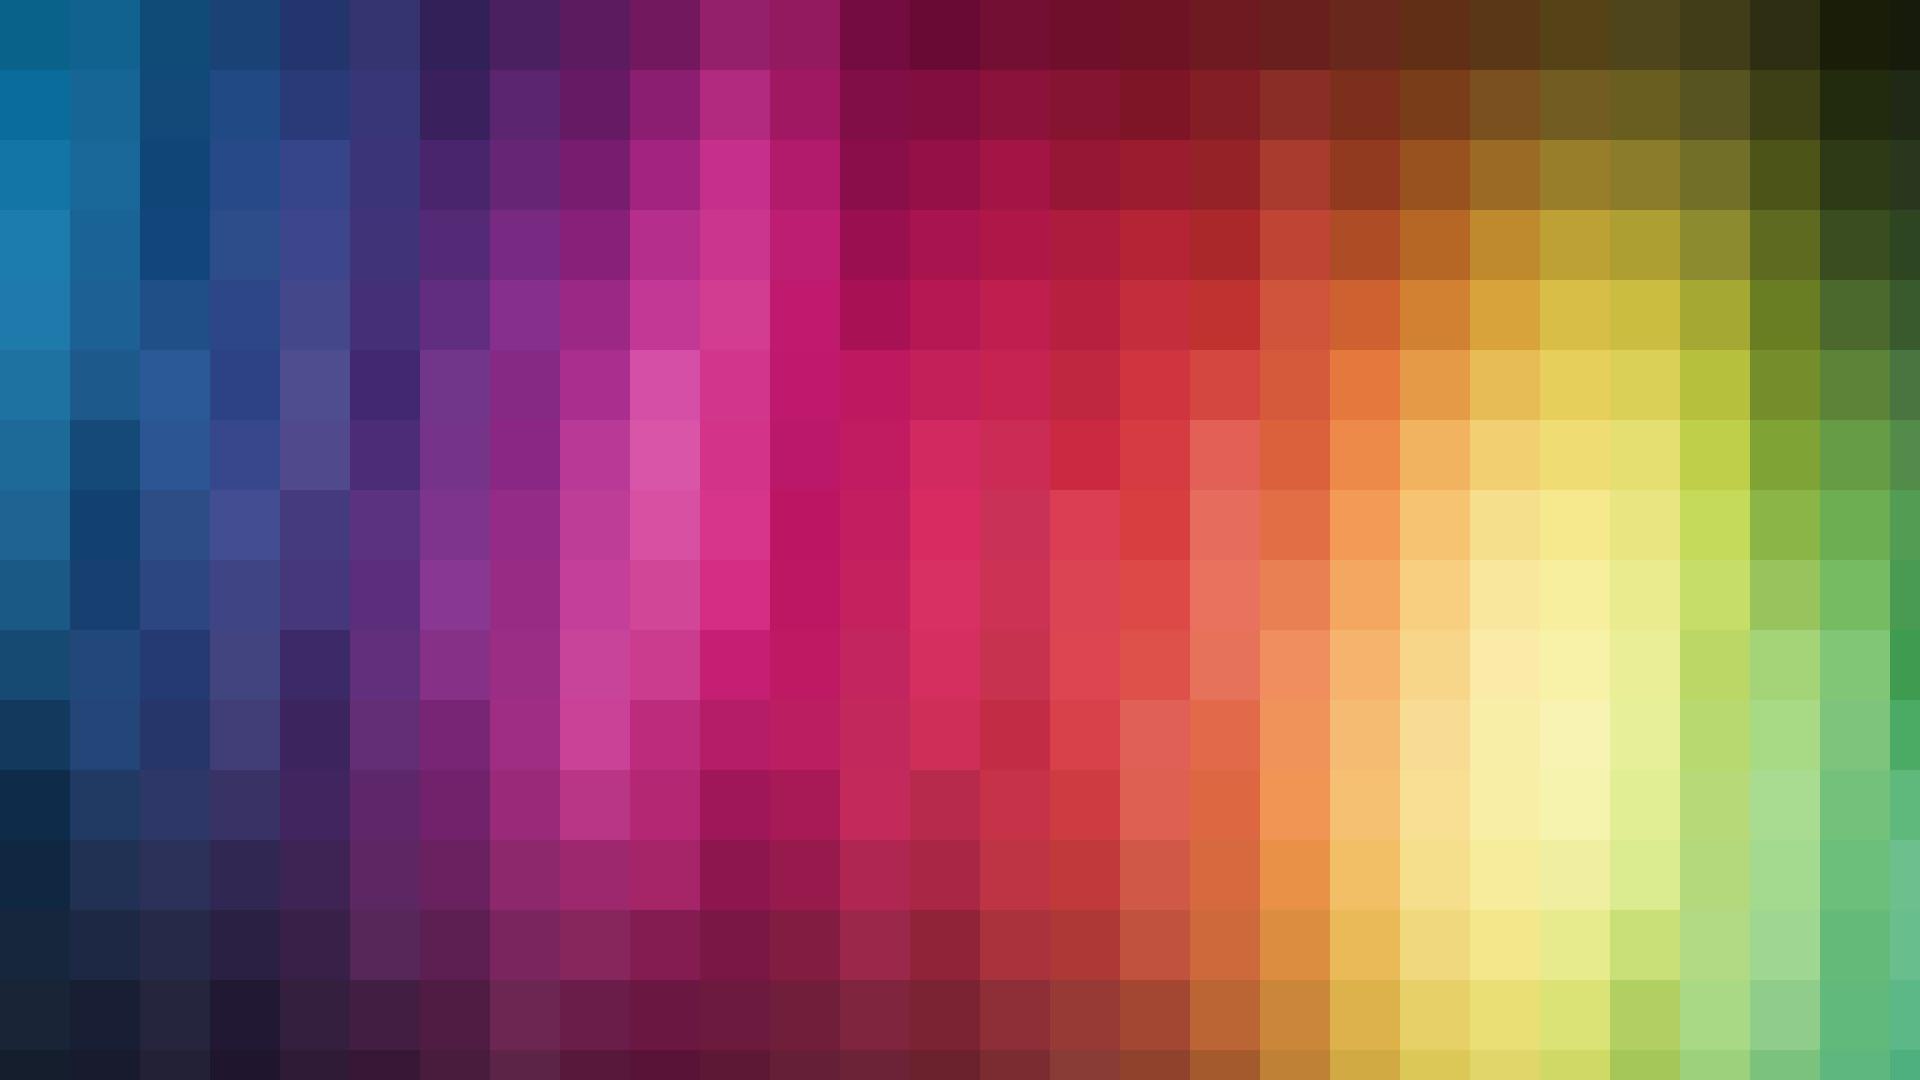 Pixel Game Background wallpaper.